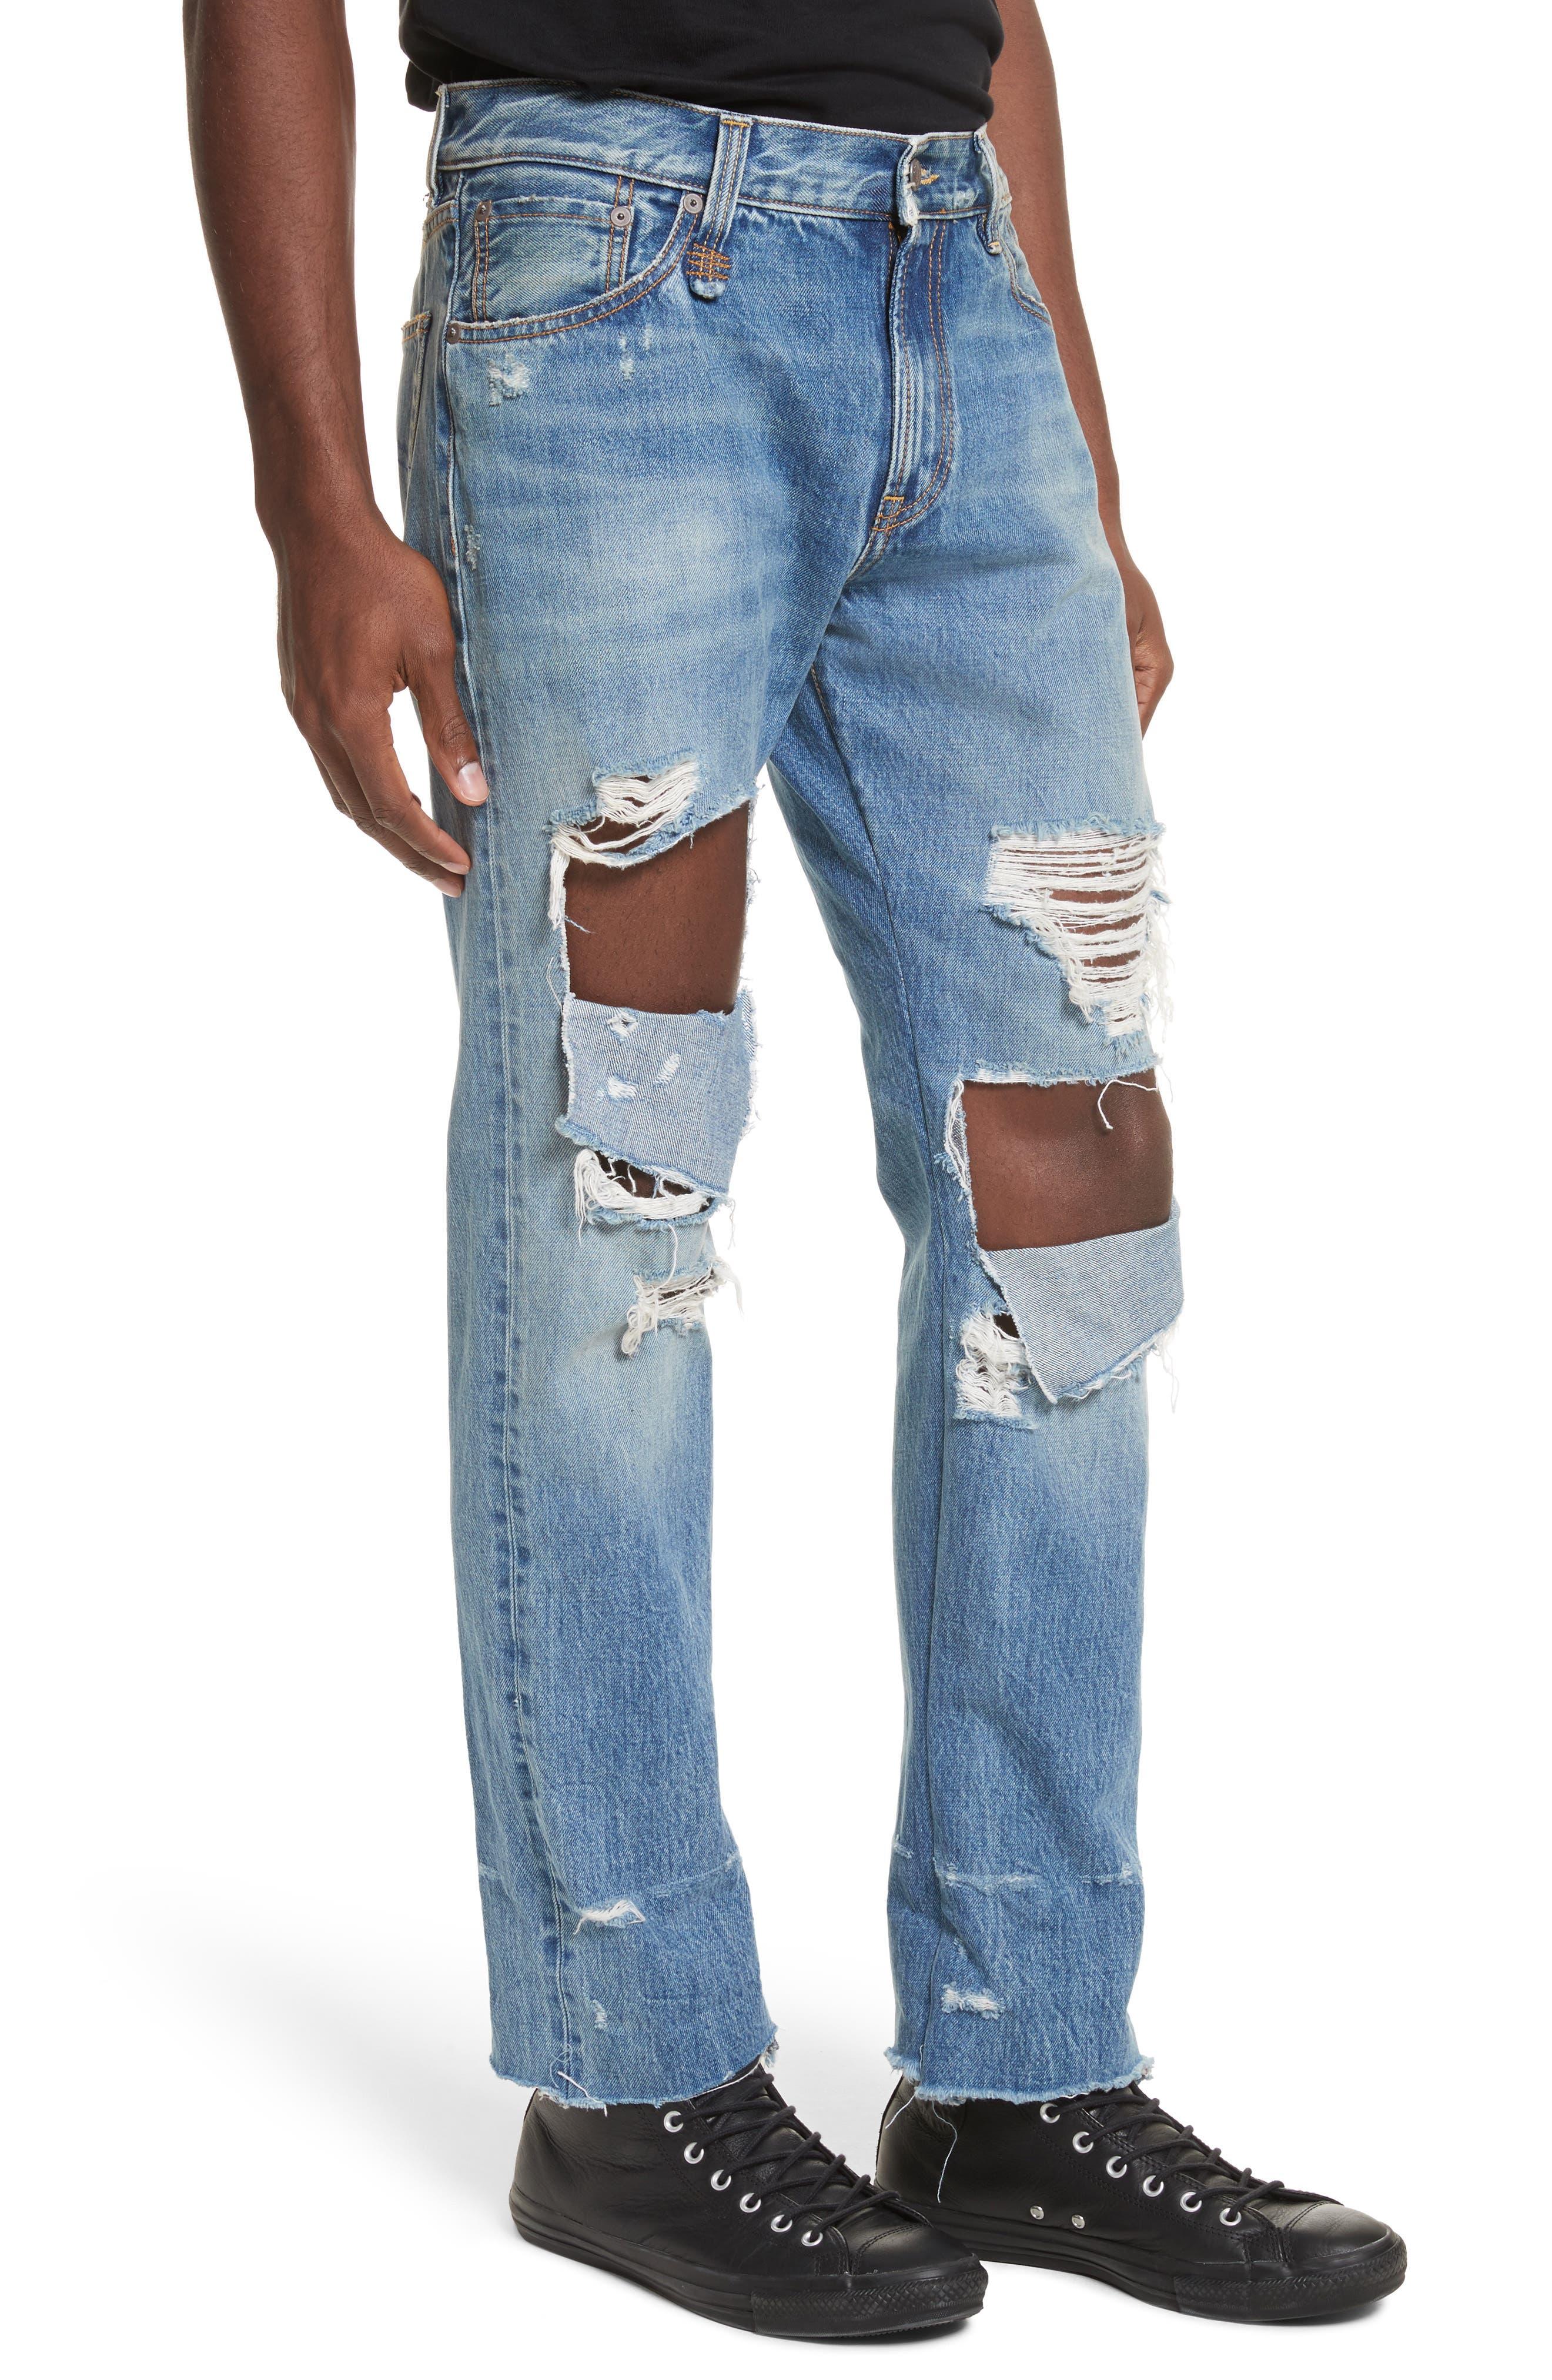 Sid Distressed Cutoff Straight Leg Jeans,                             Alternate thumbnail 4, color,                             Jasper Selvege W Rips